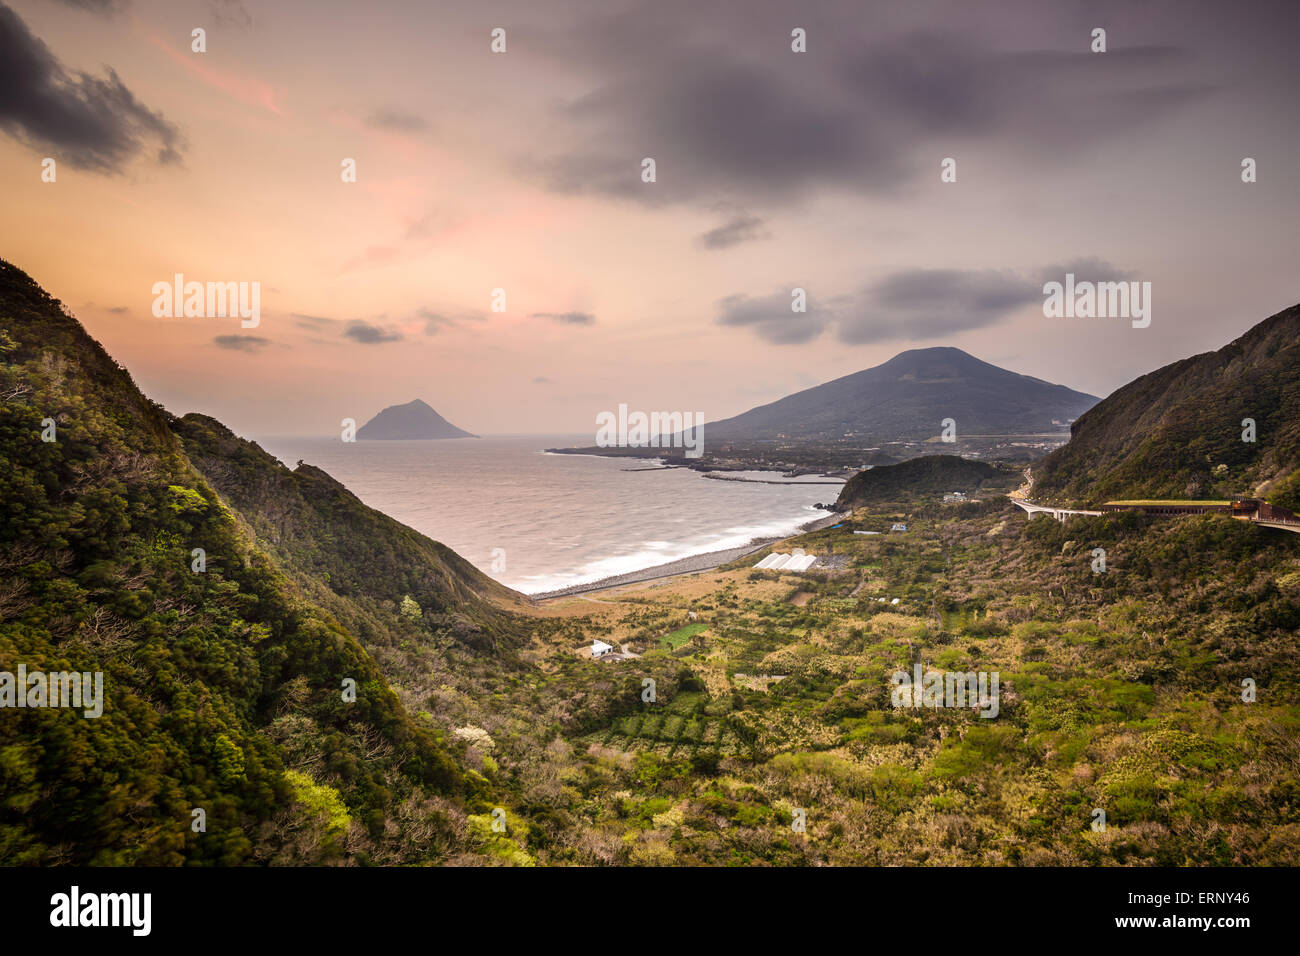 Hachijojima, Japan coastal landscape. - Stock Image